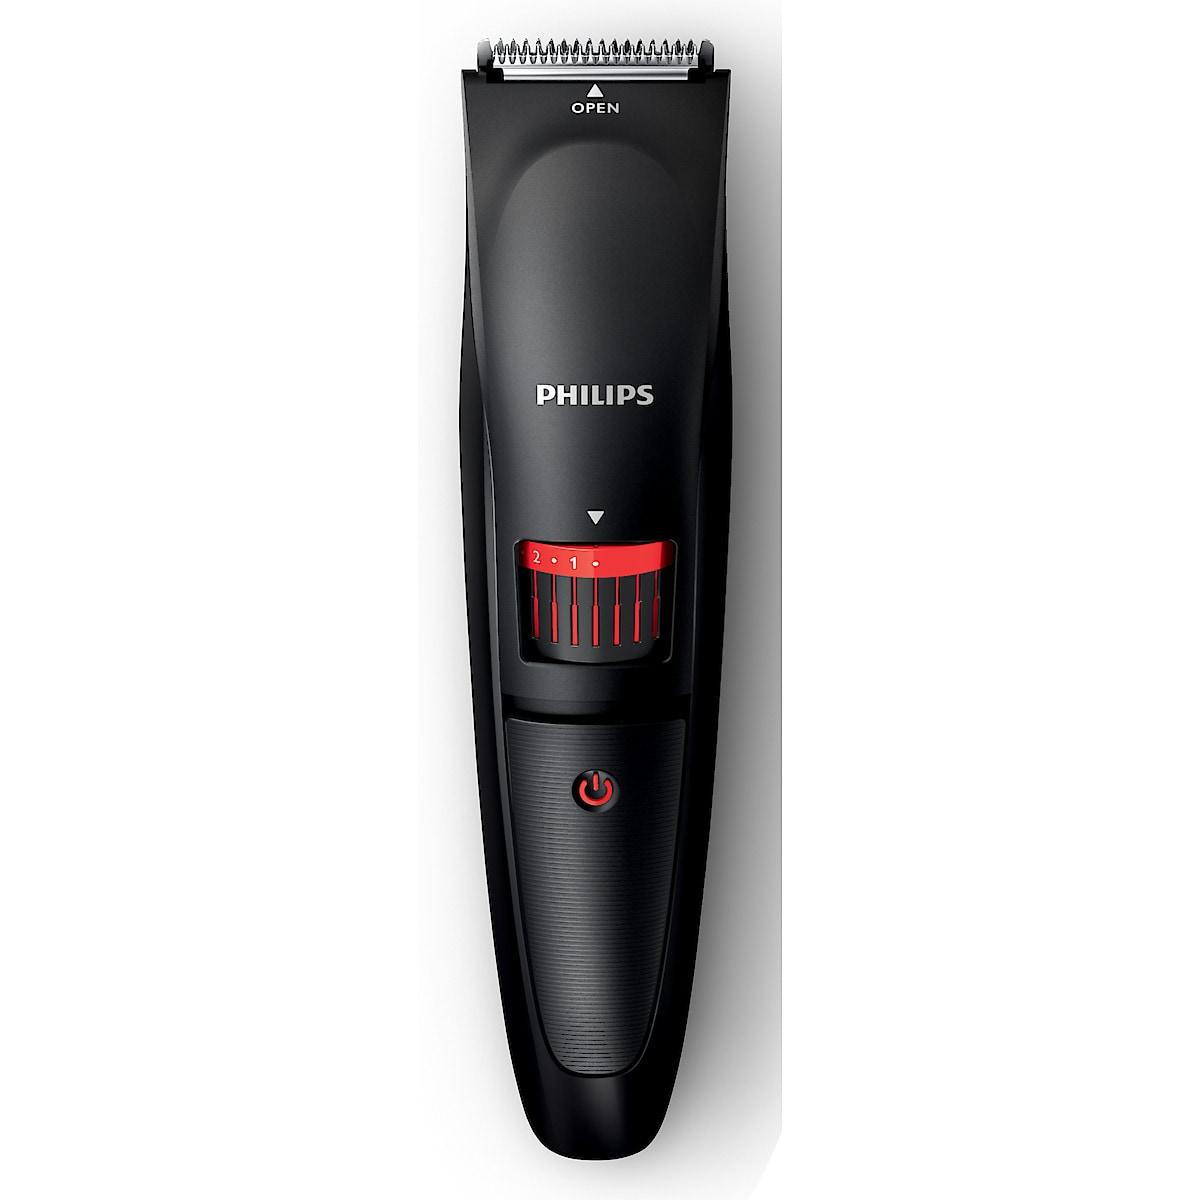 Partatrimmeri Philips QT4005/15